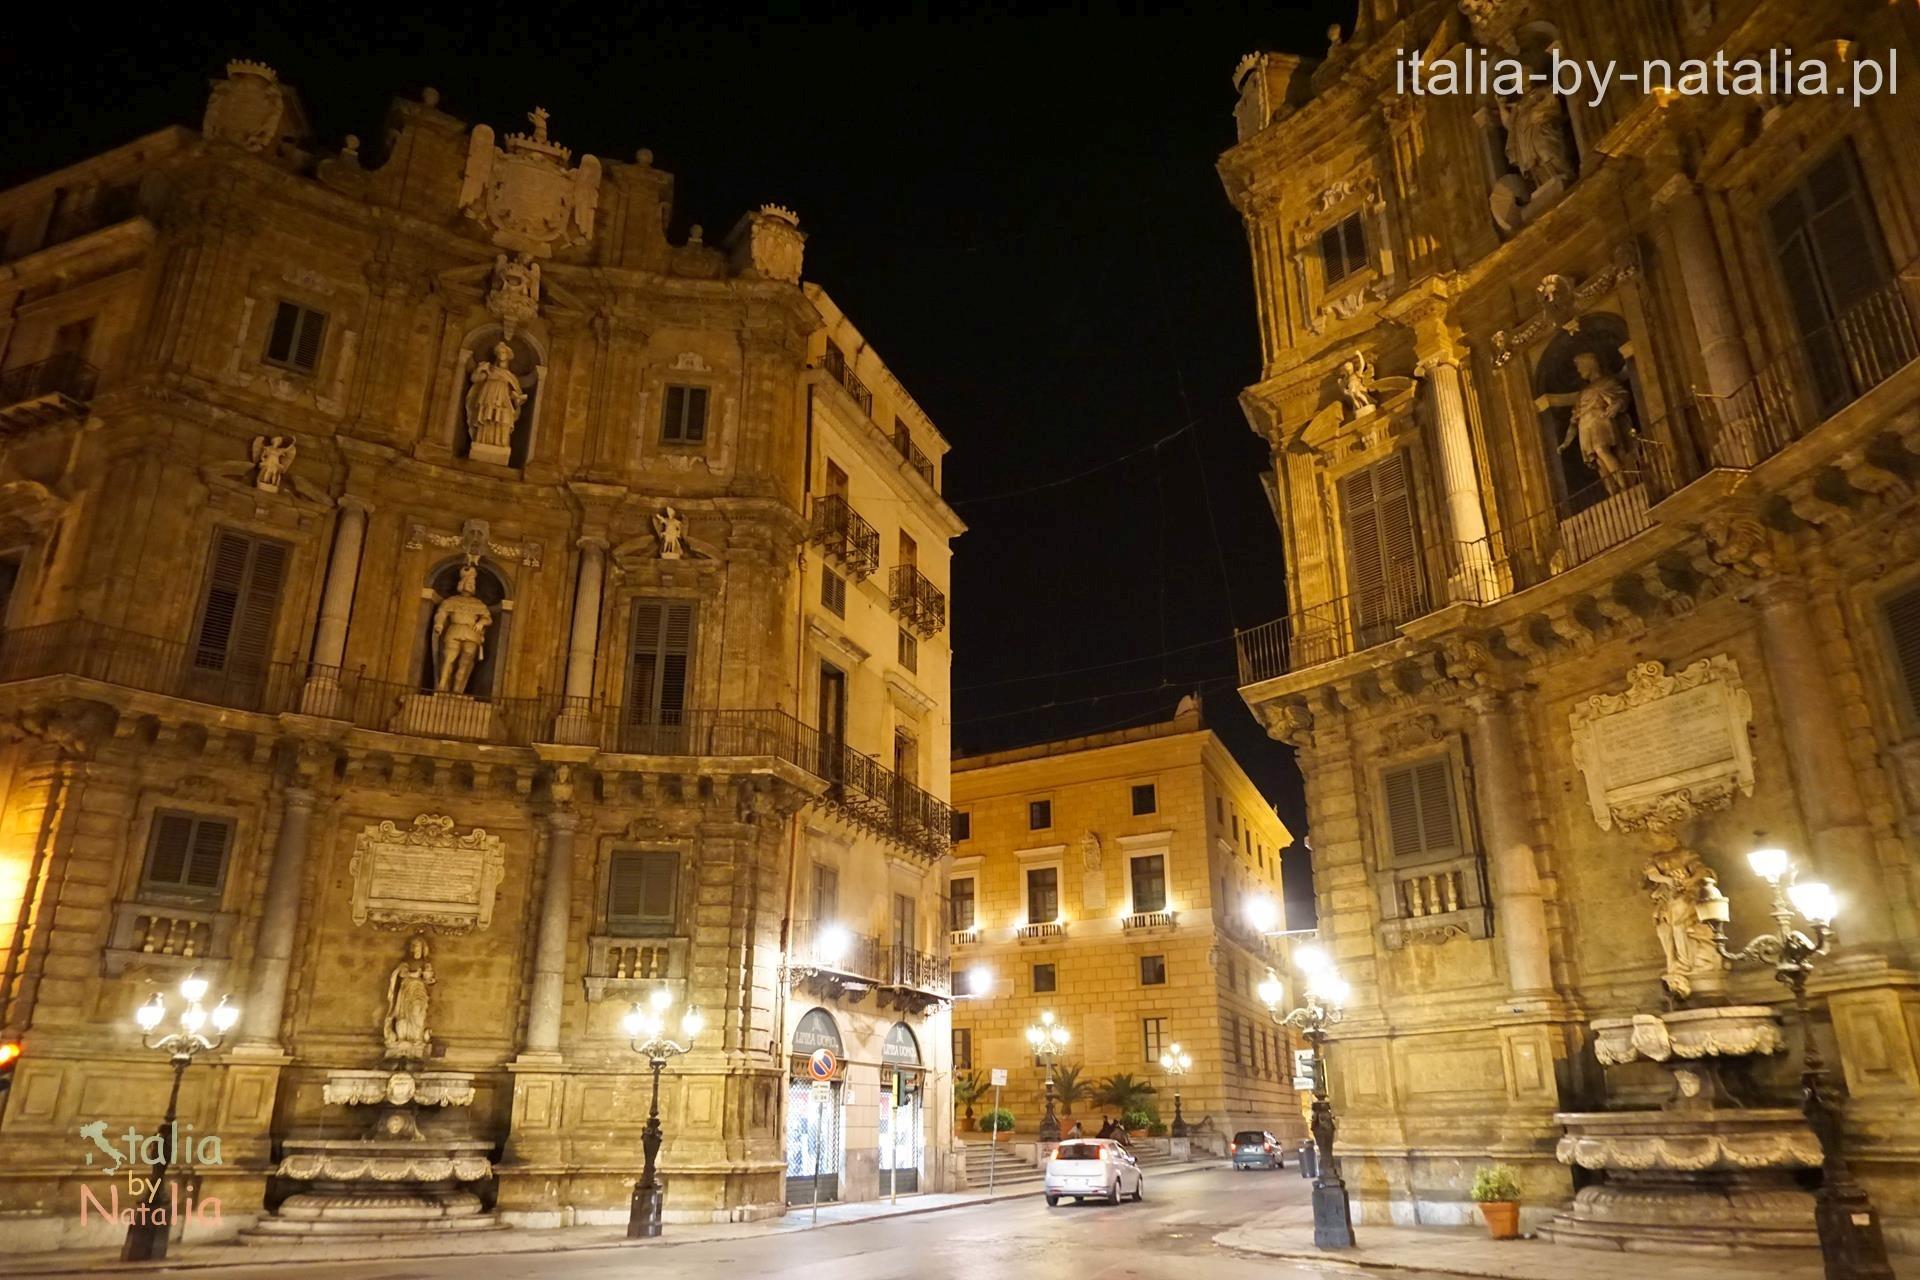 Quatro Canti Palermo